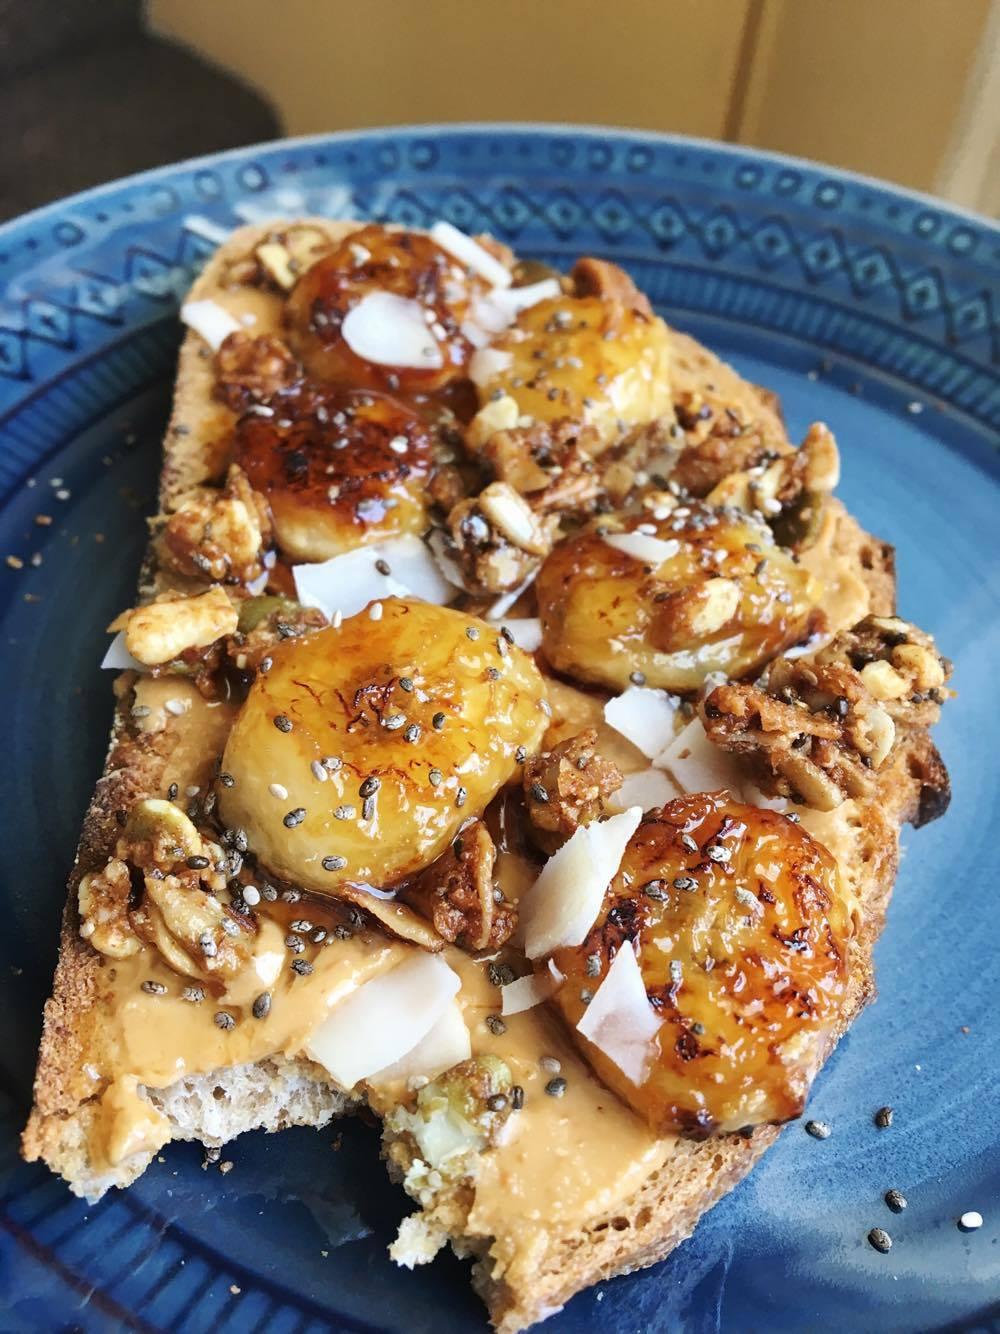 Caramelized Nana Toast